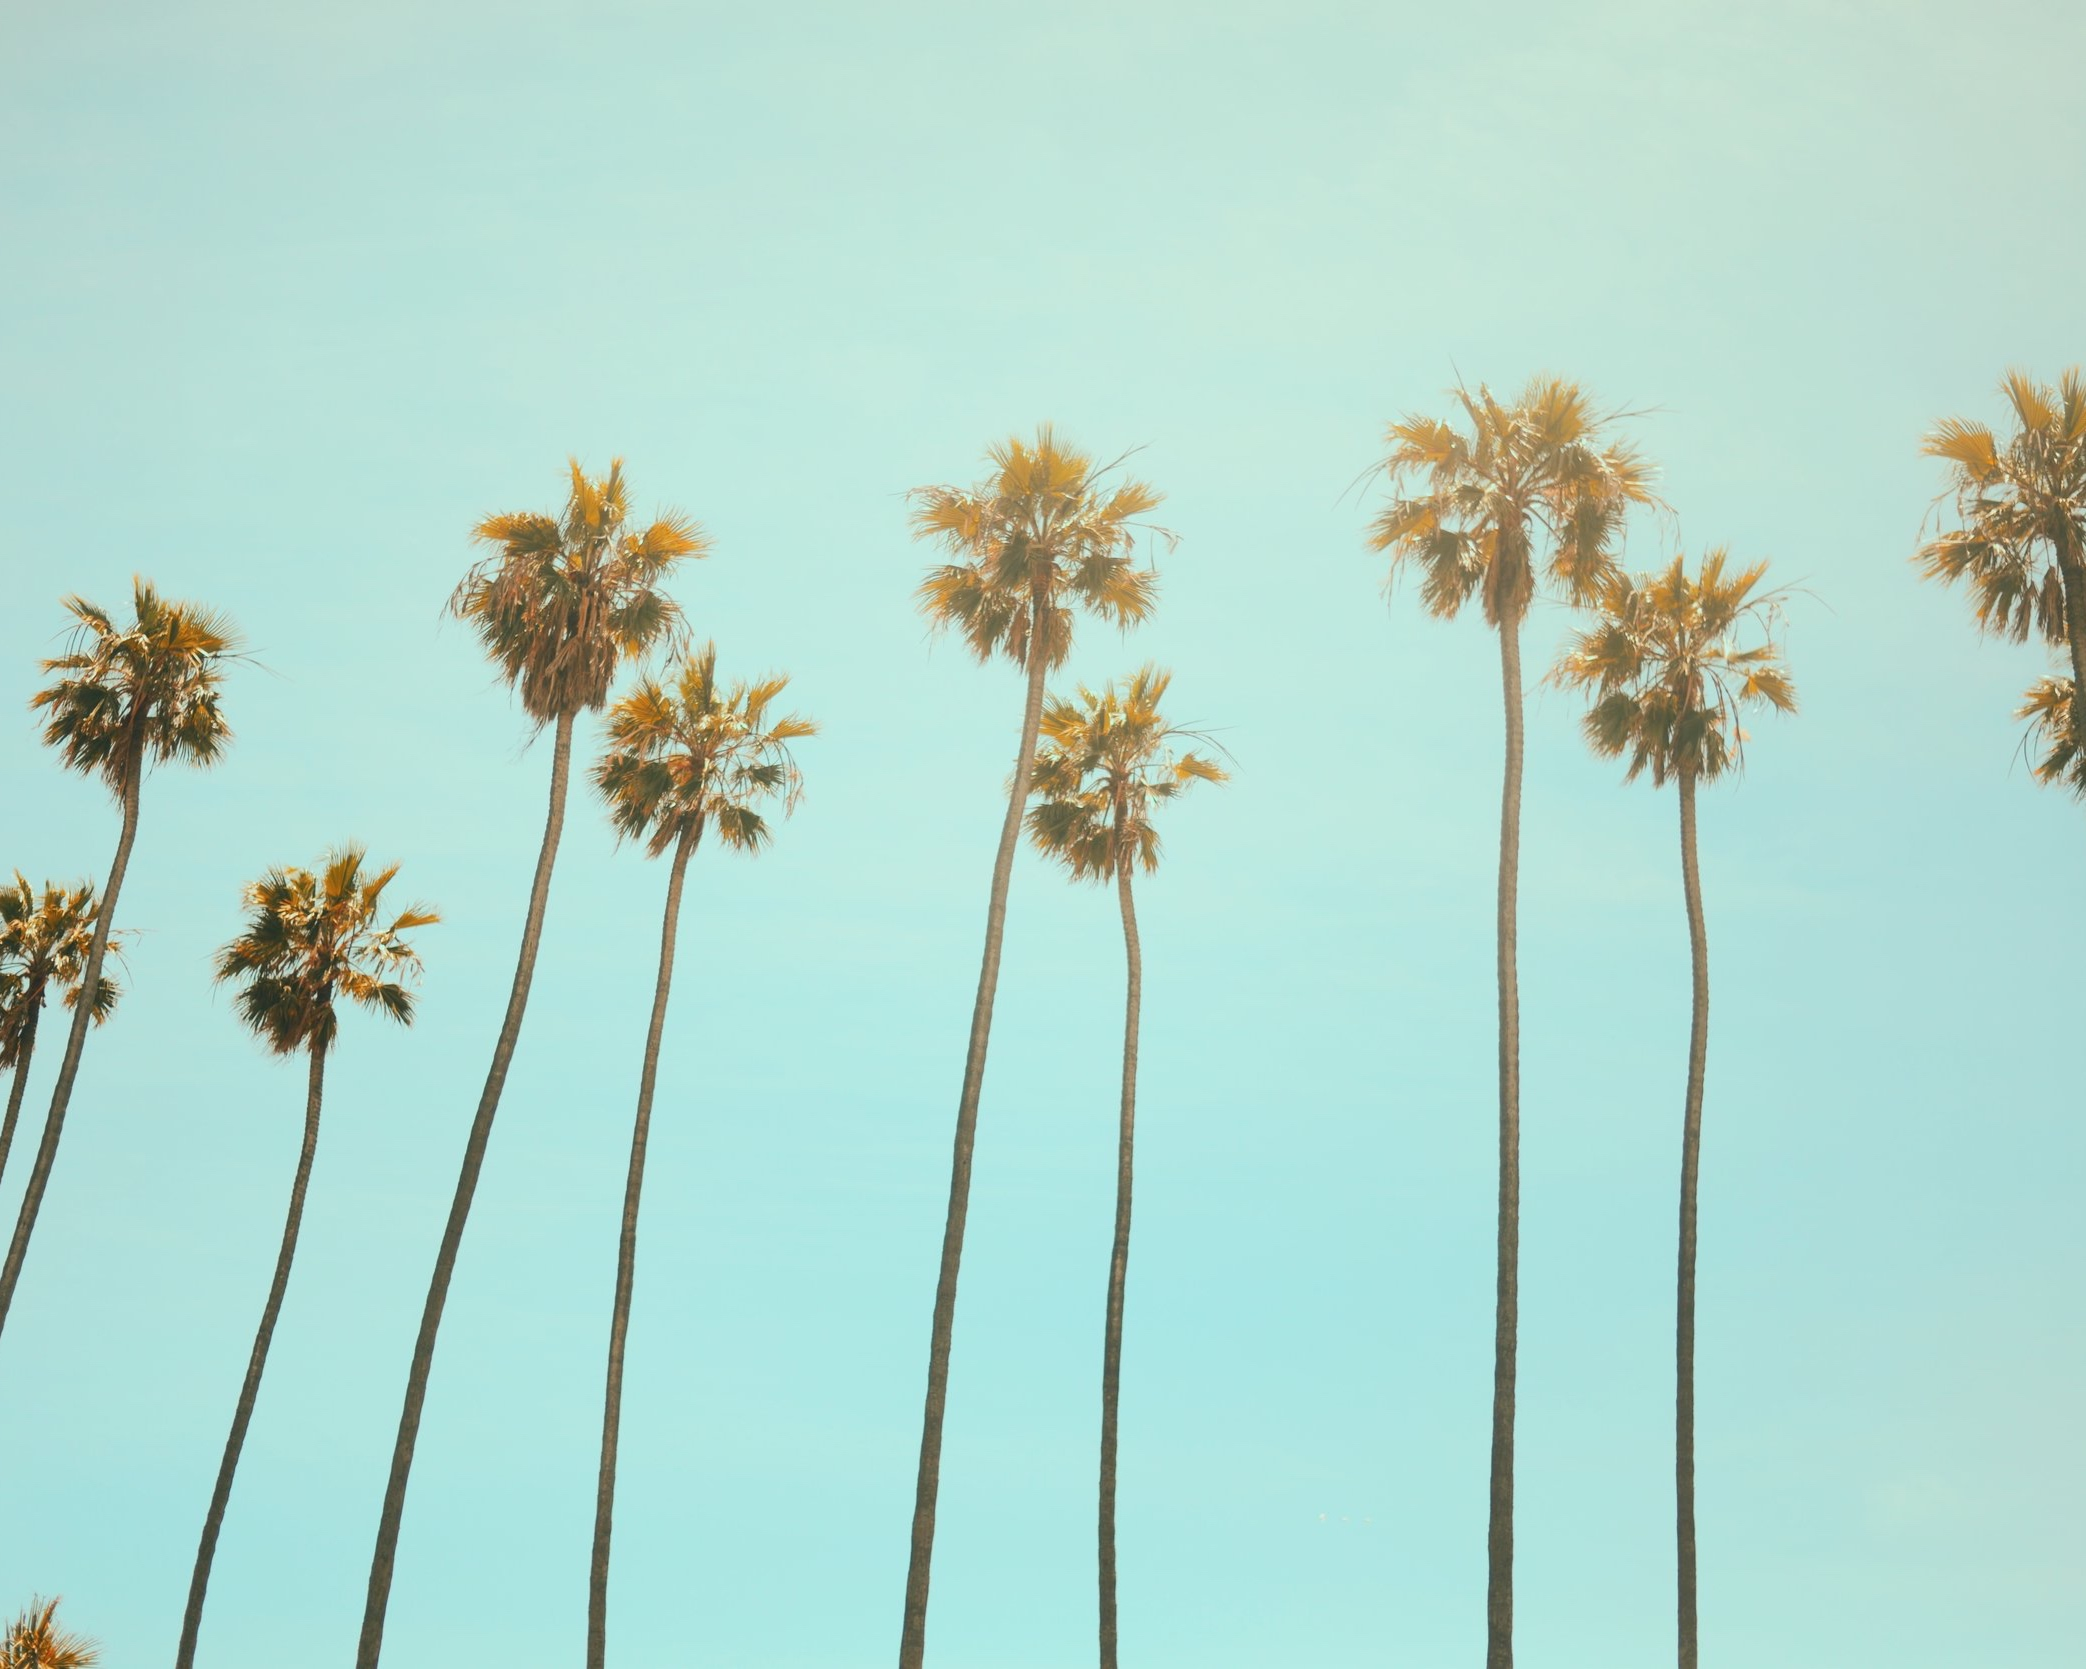 Los Angeles, CA, USA -